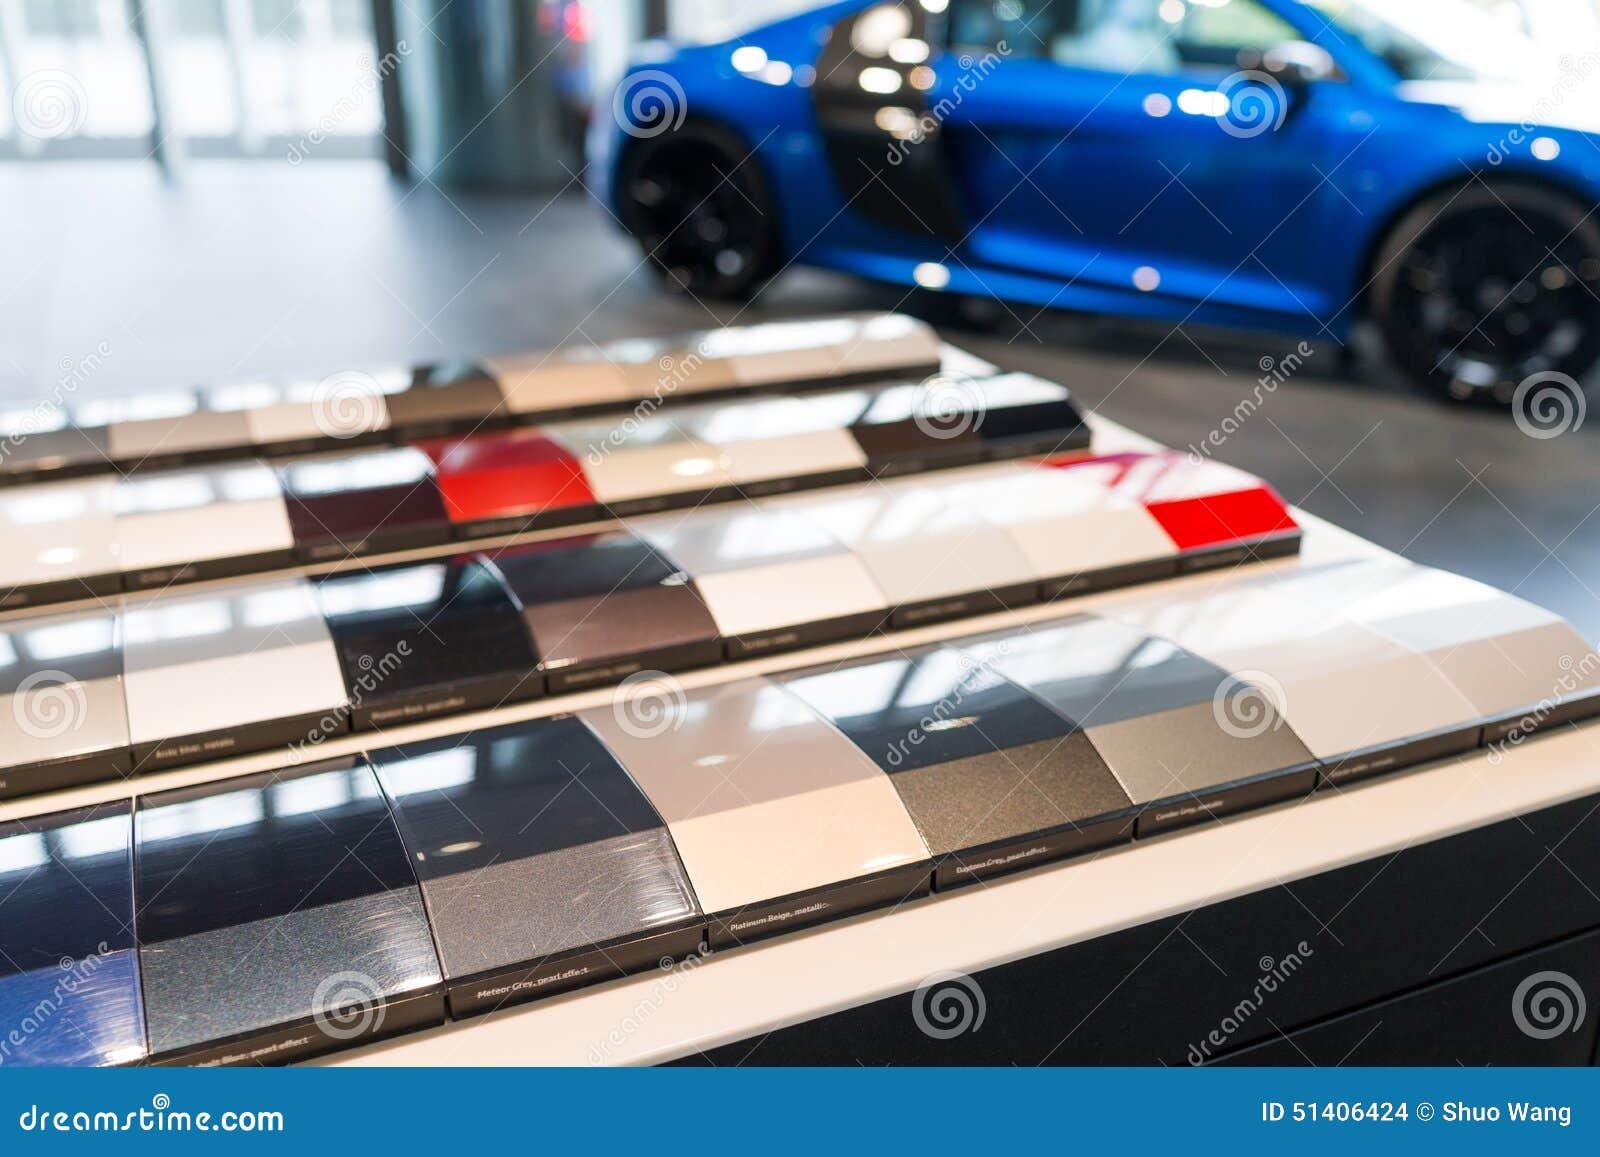 free car paint samples